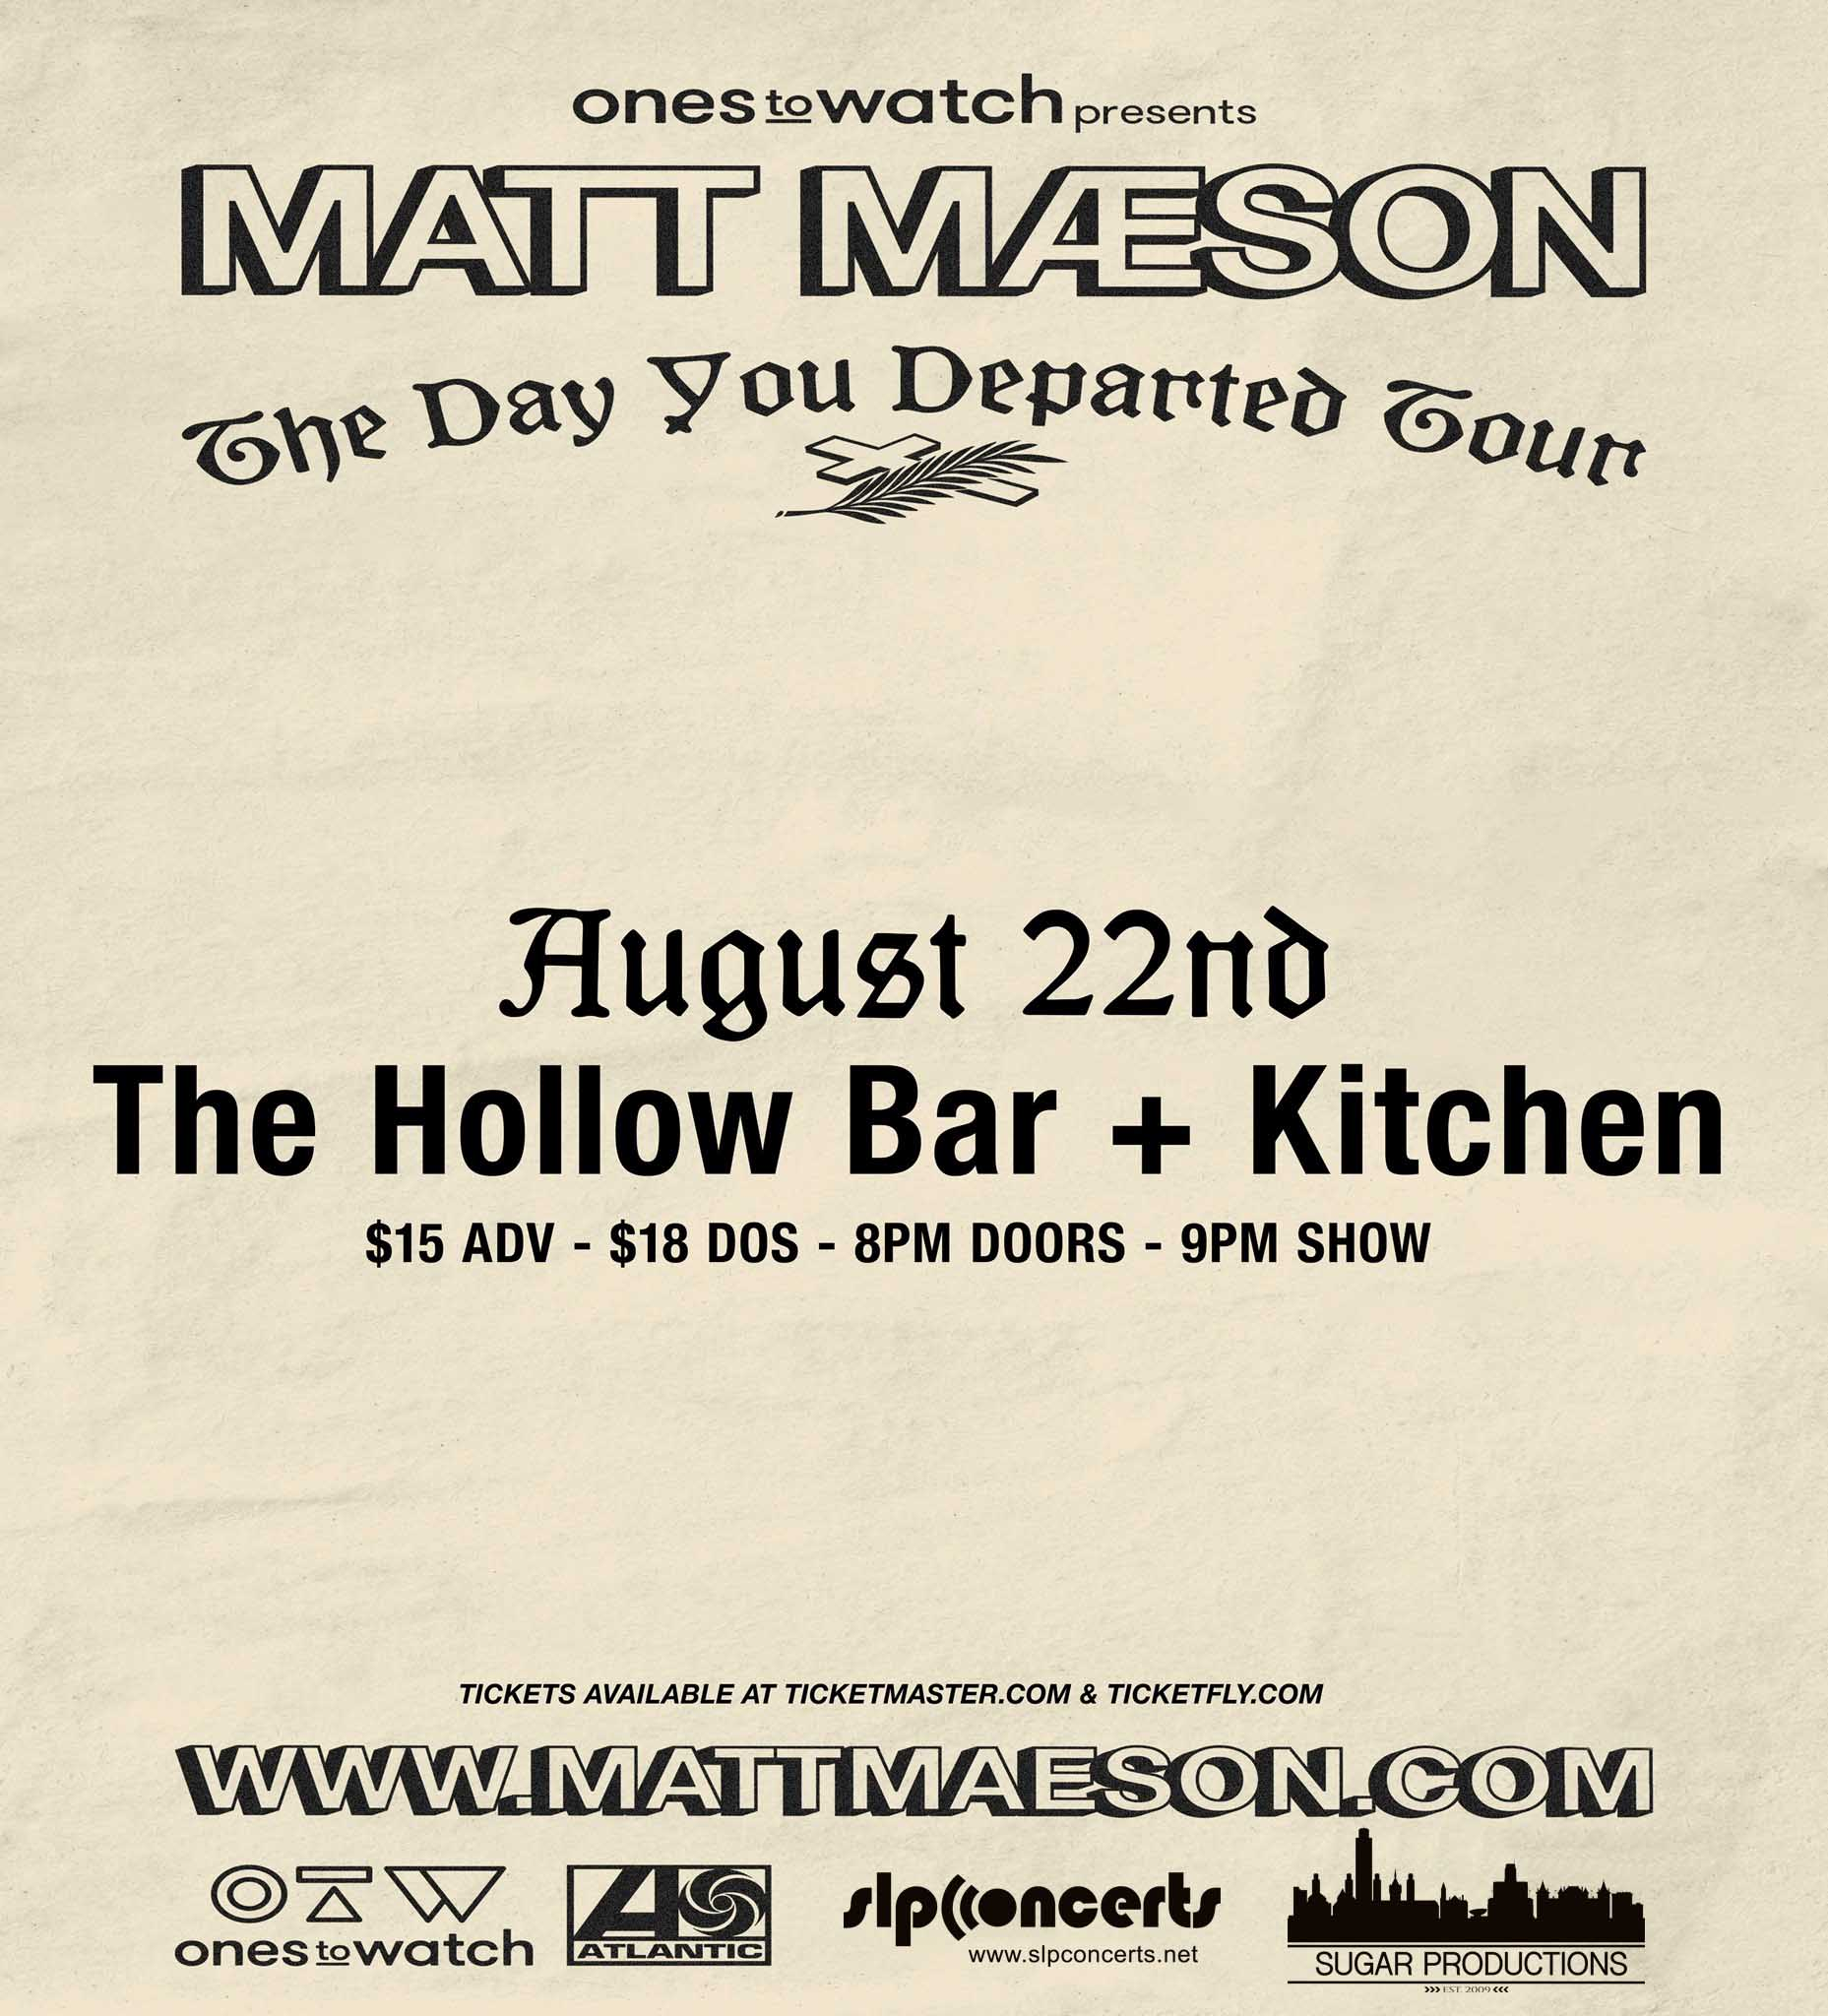 MATT MAESON TDYD TOUR